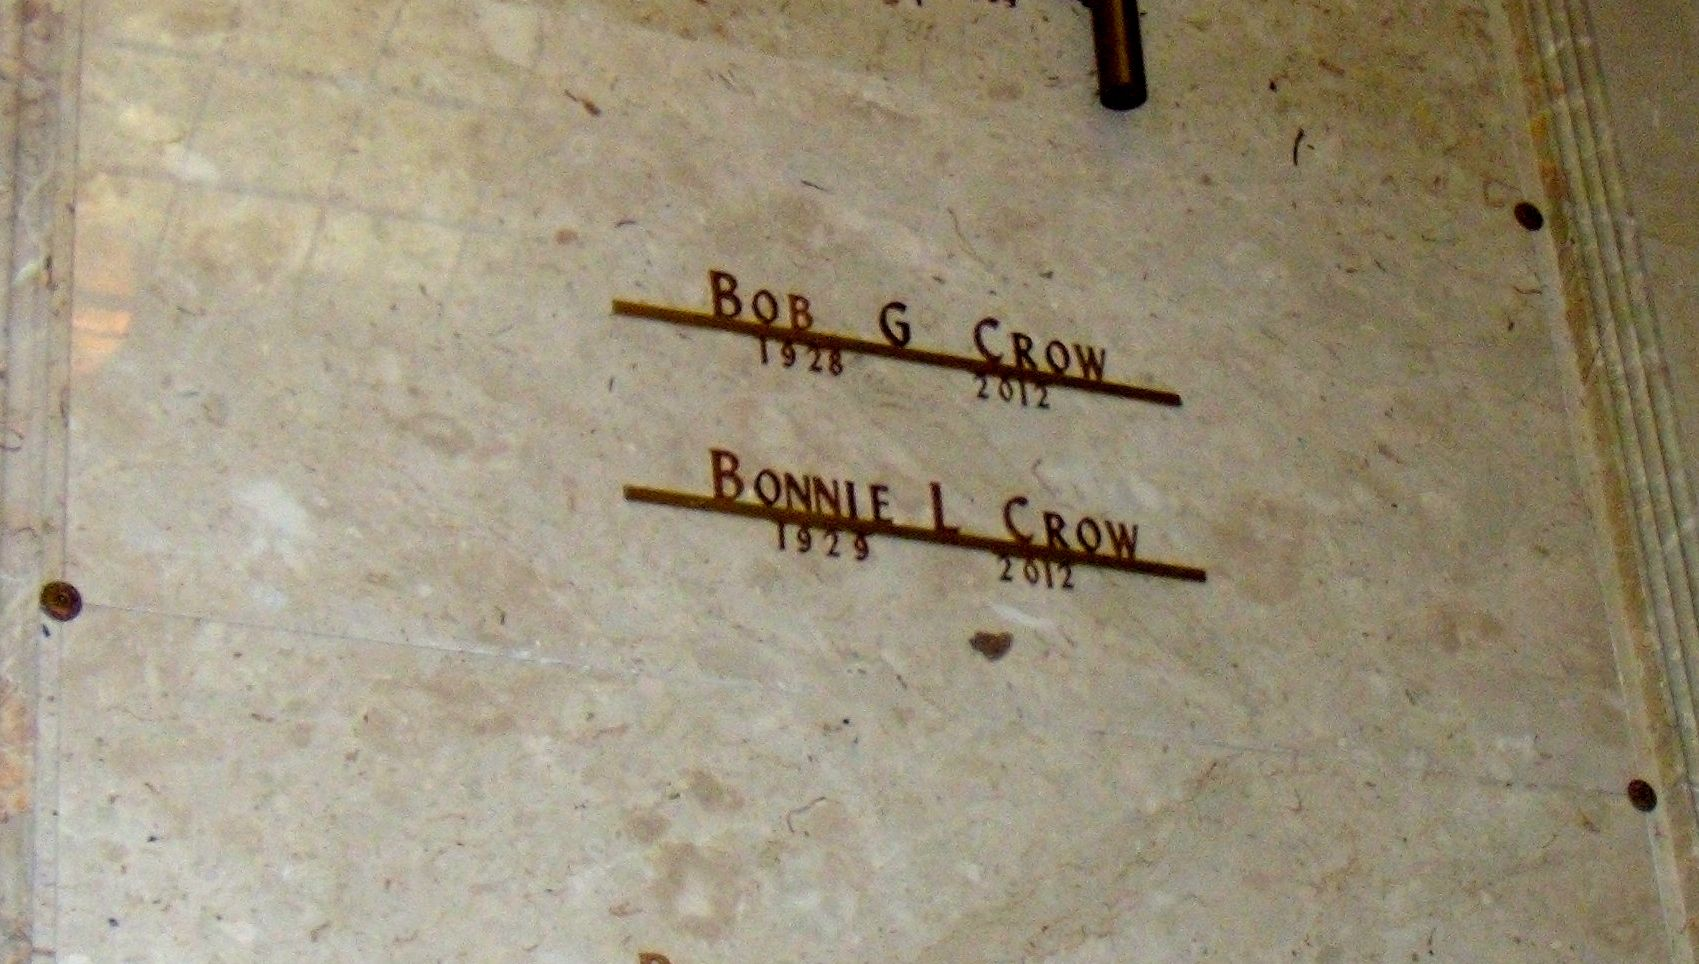 Bobby Gene Crow